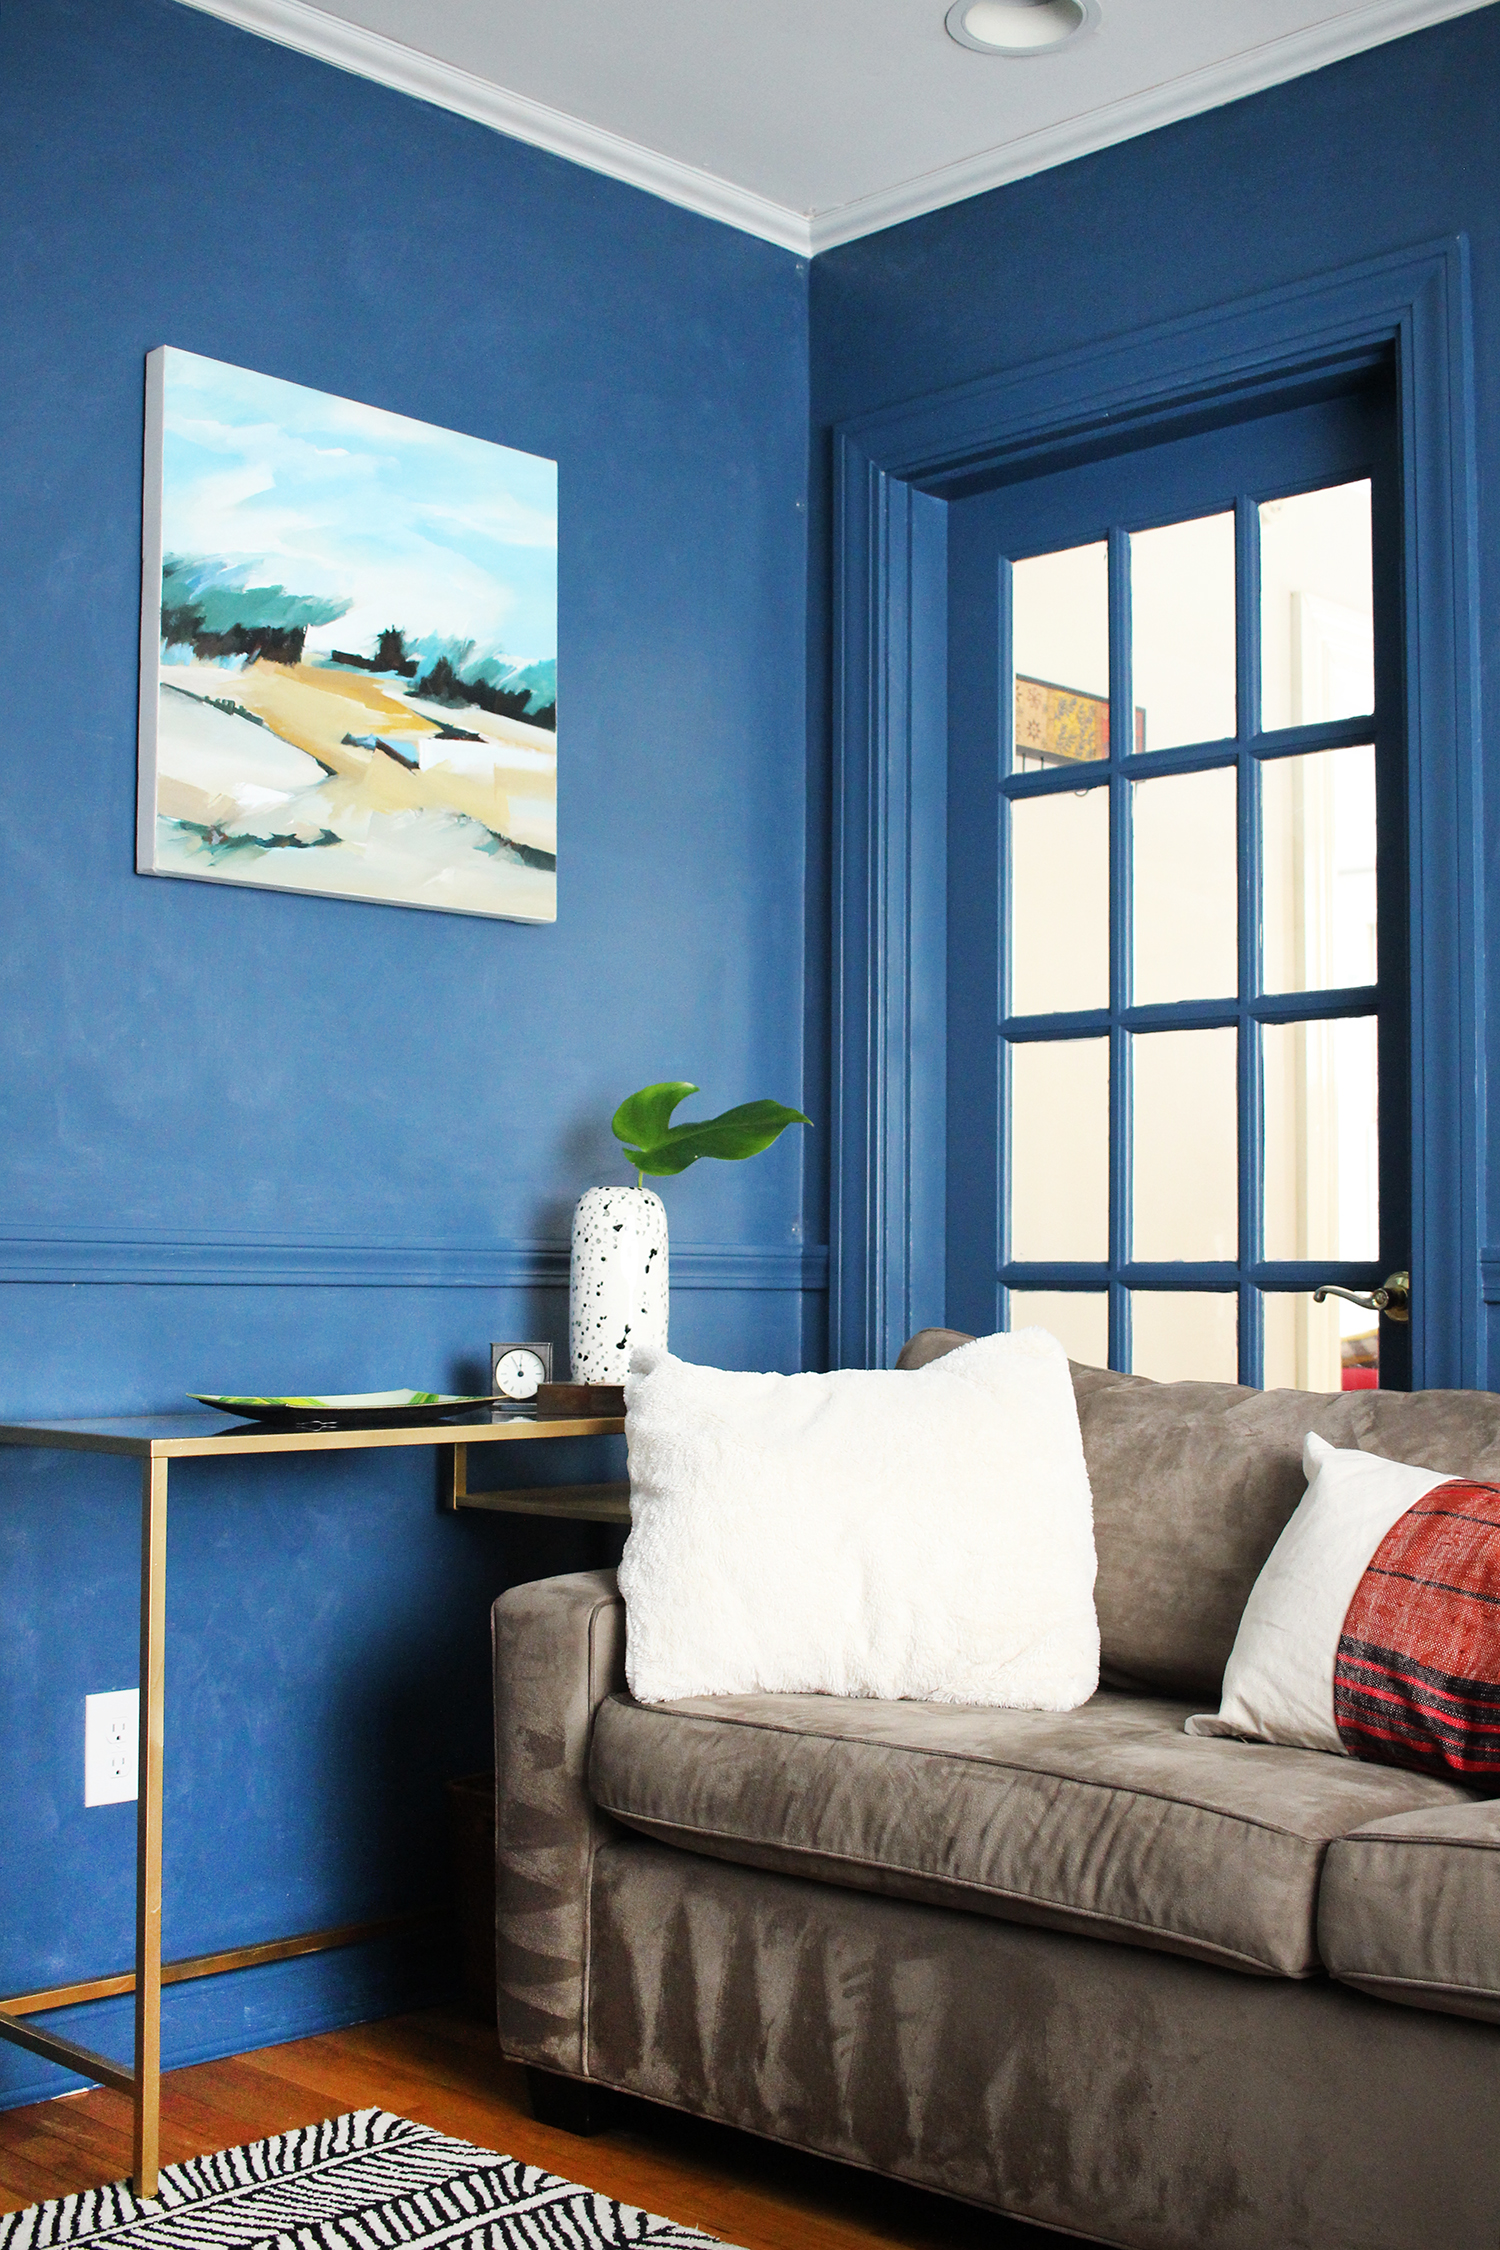 Zandra's Blue TV Room